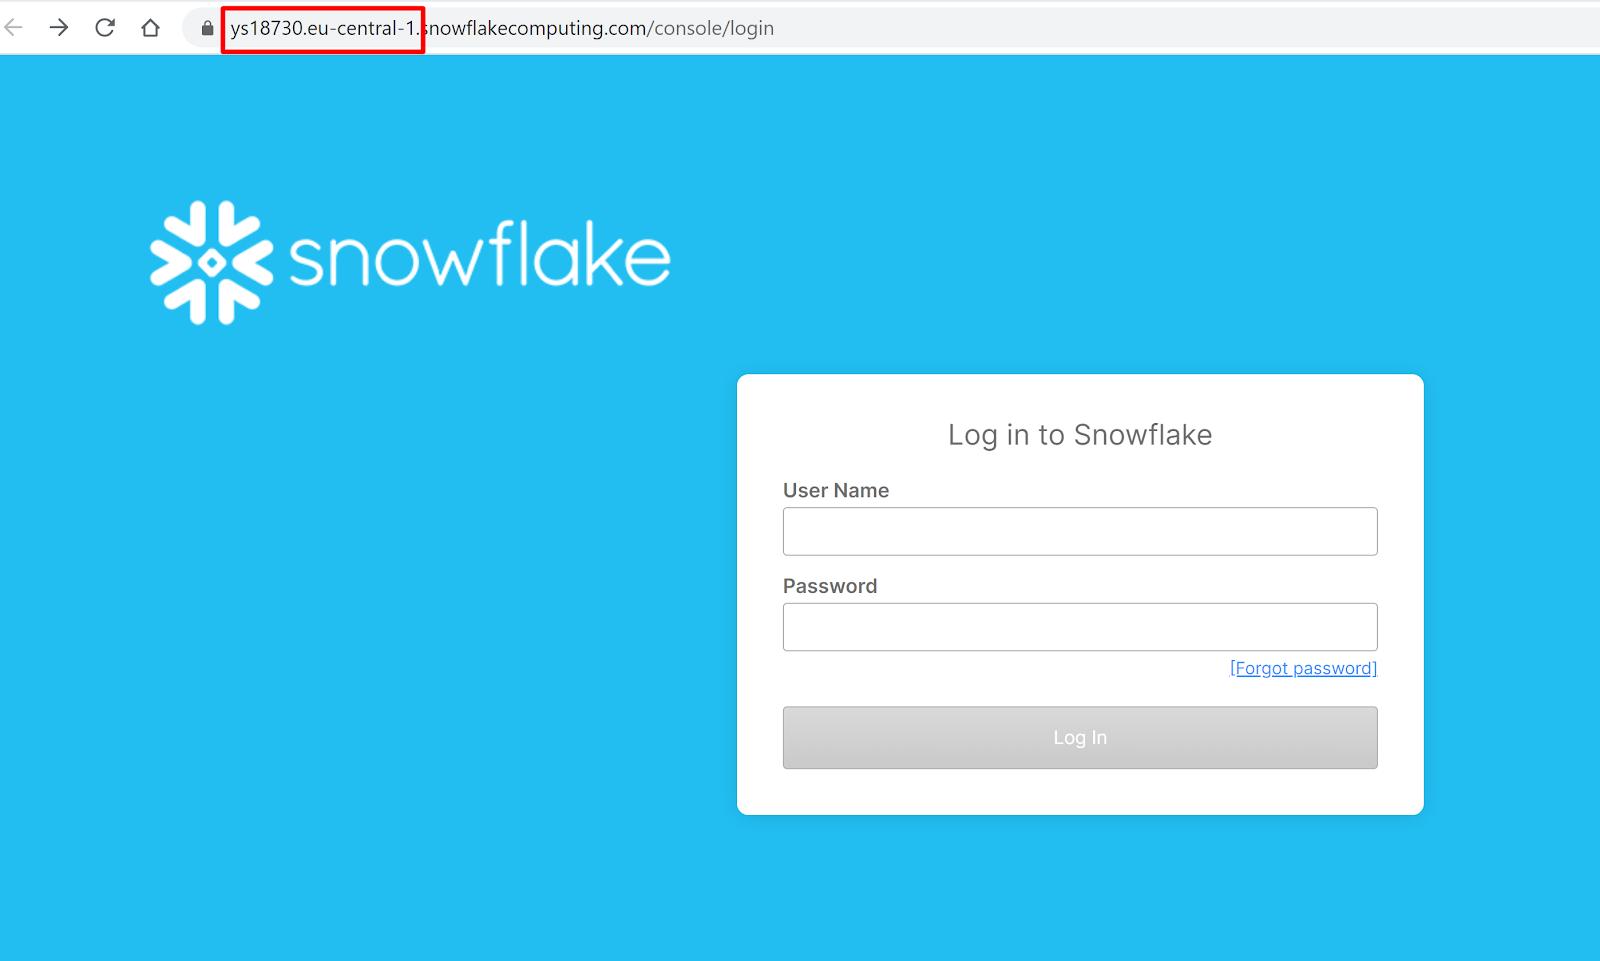 Snowflake URL